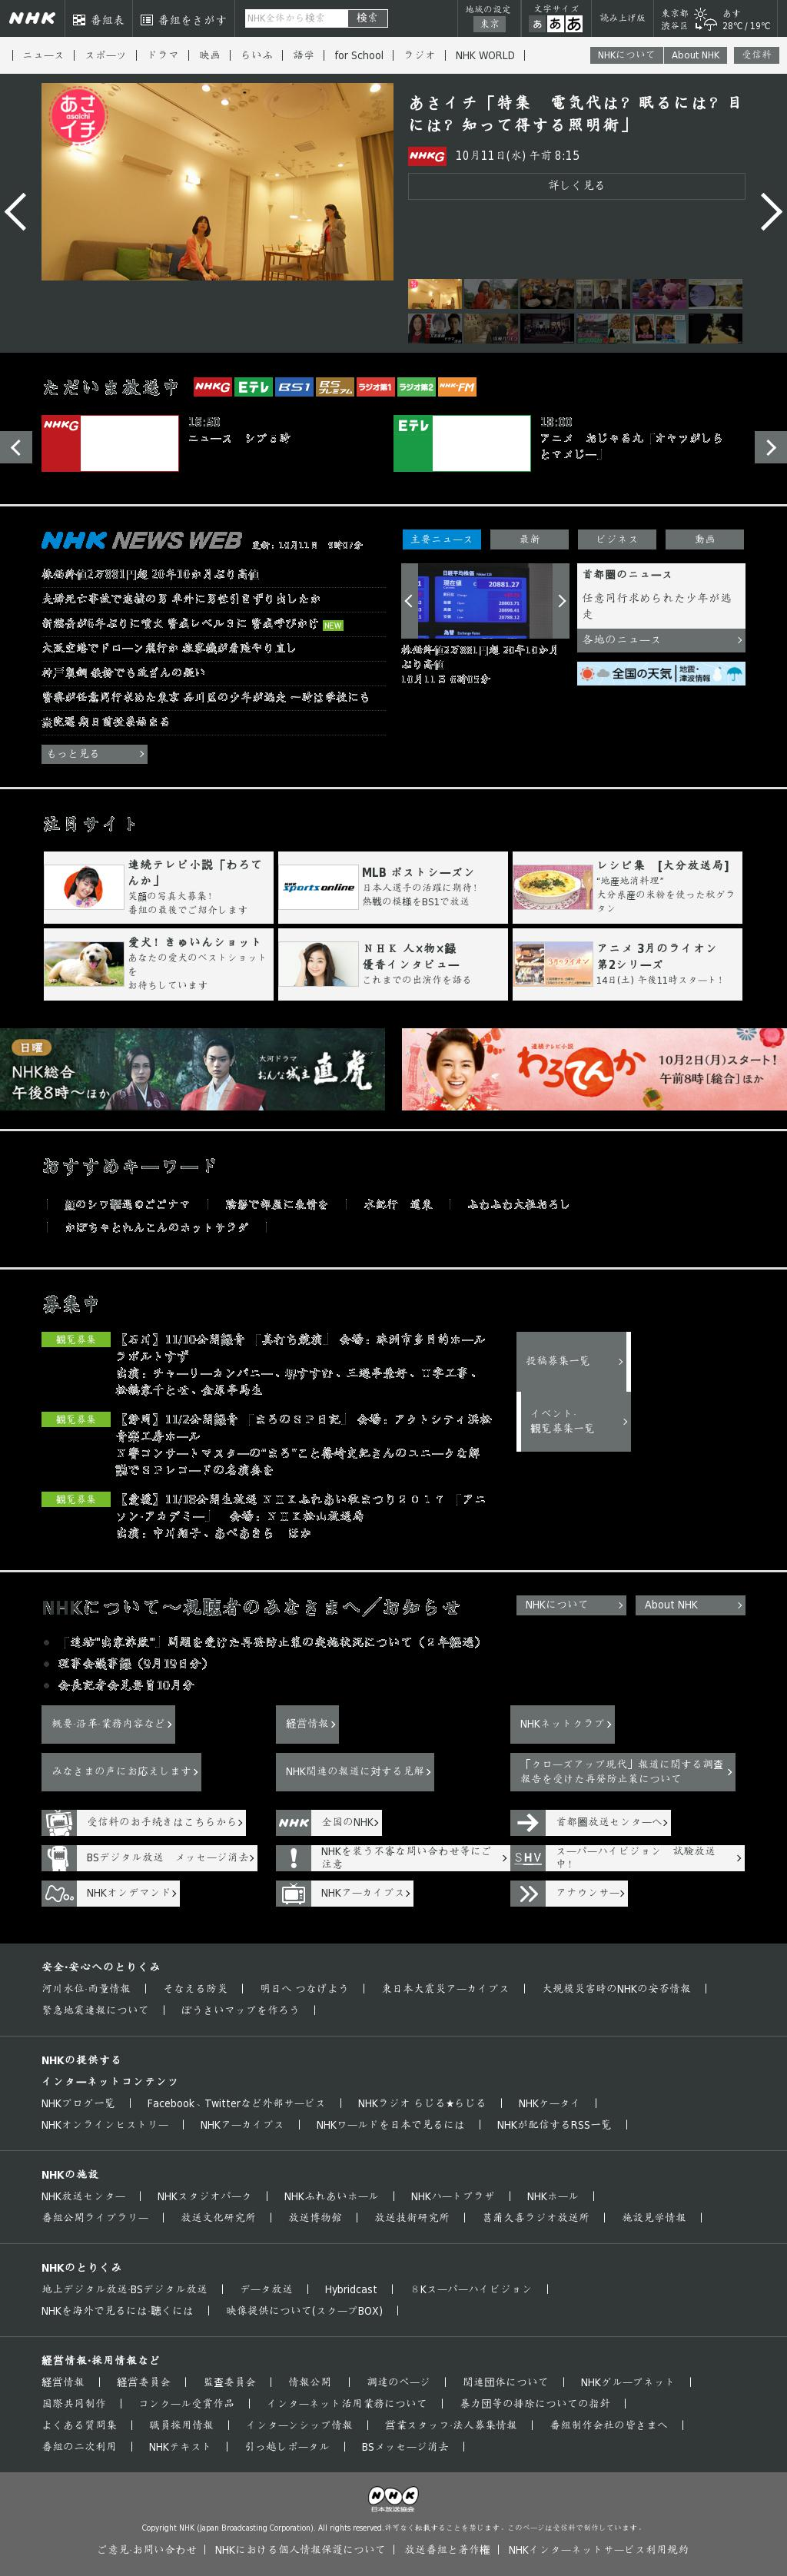 NHK Online at Wednesday Oct. 11, 2017, 9:08 a.m. UTC